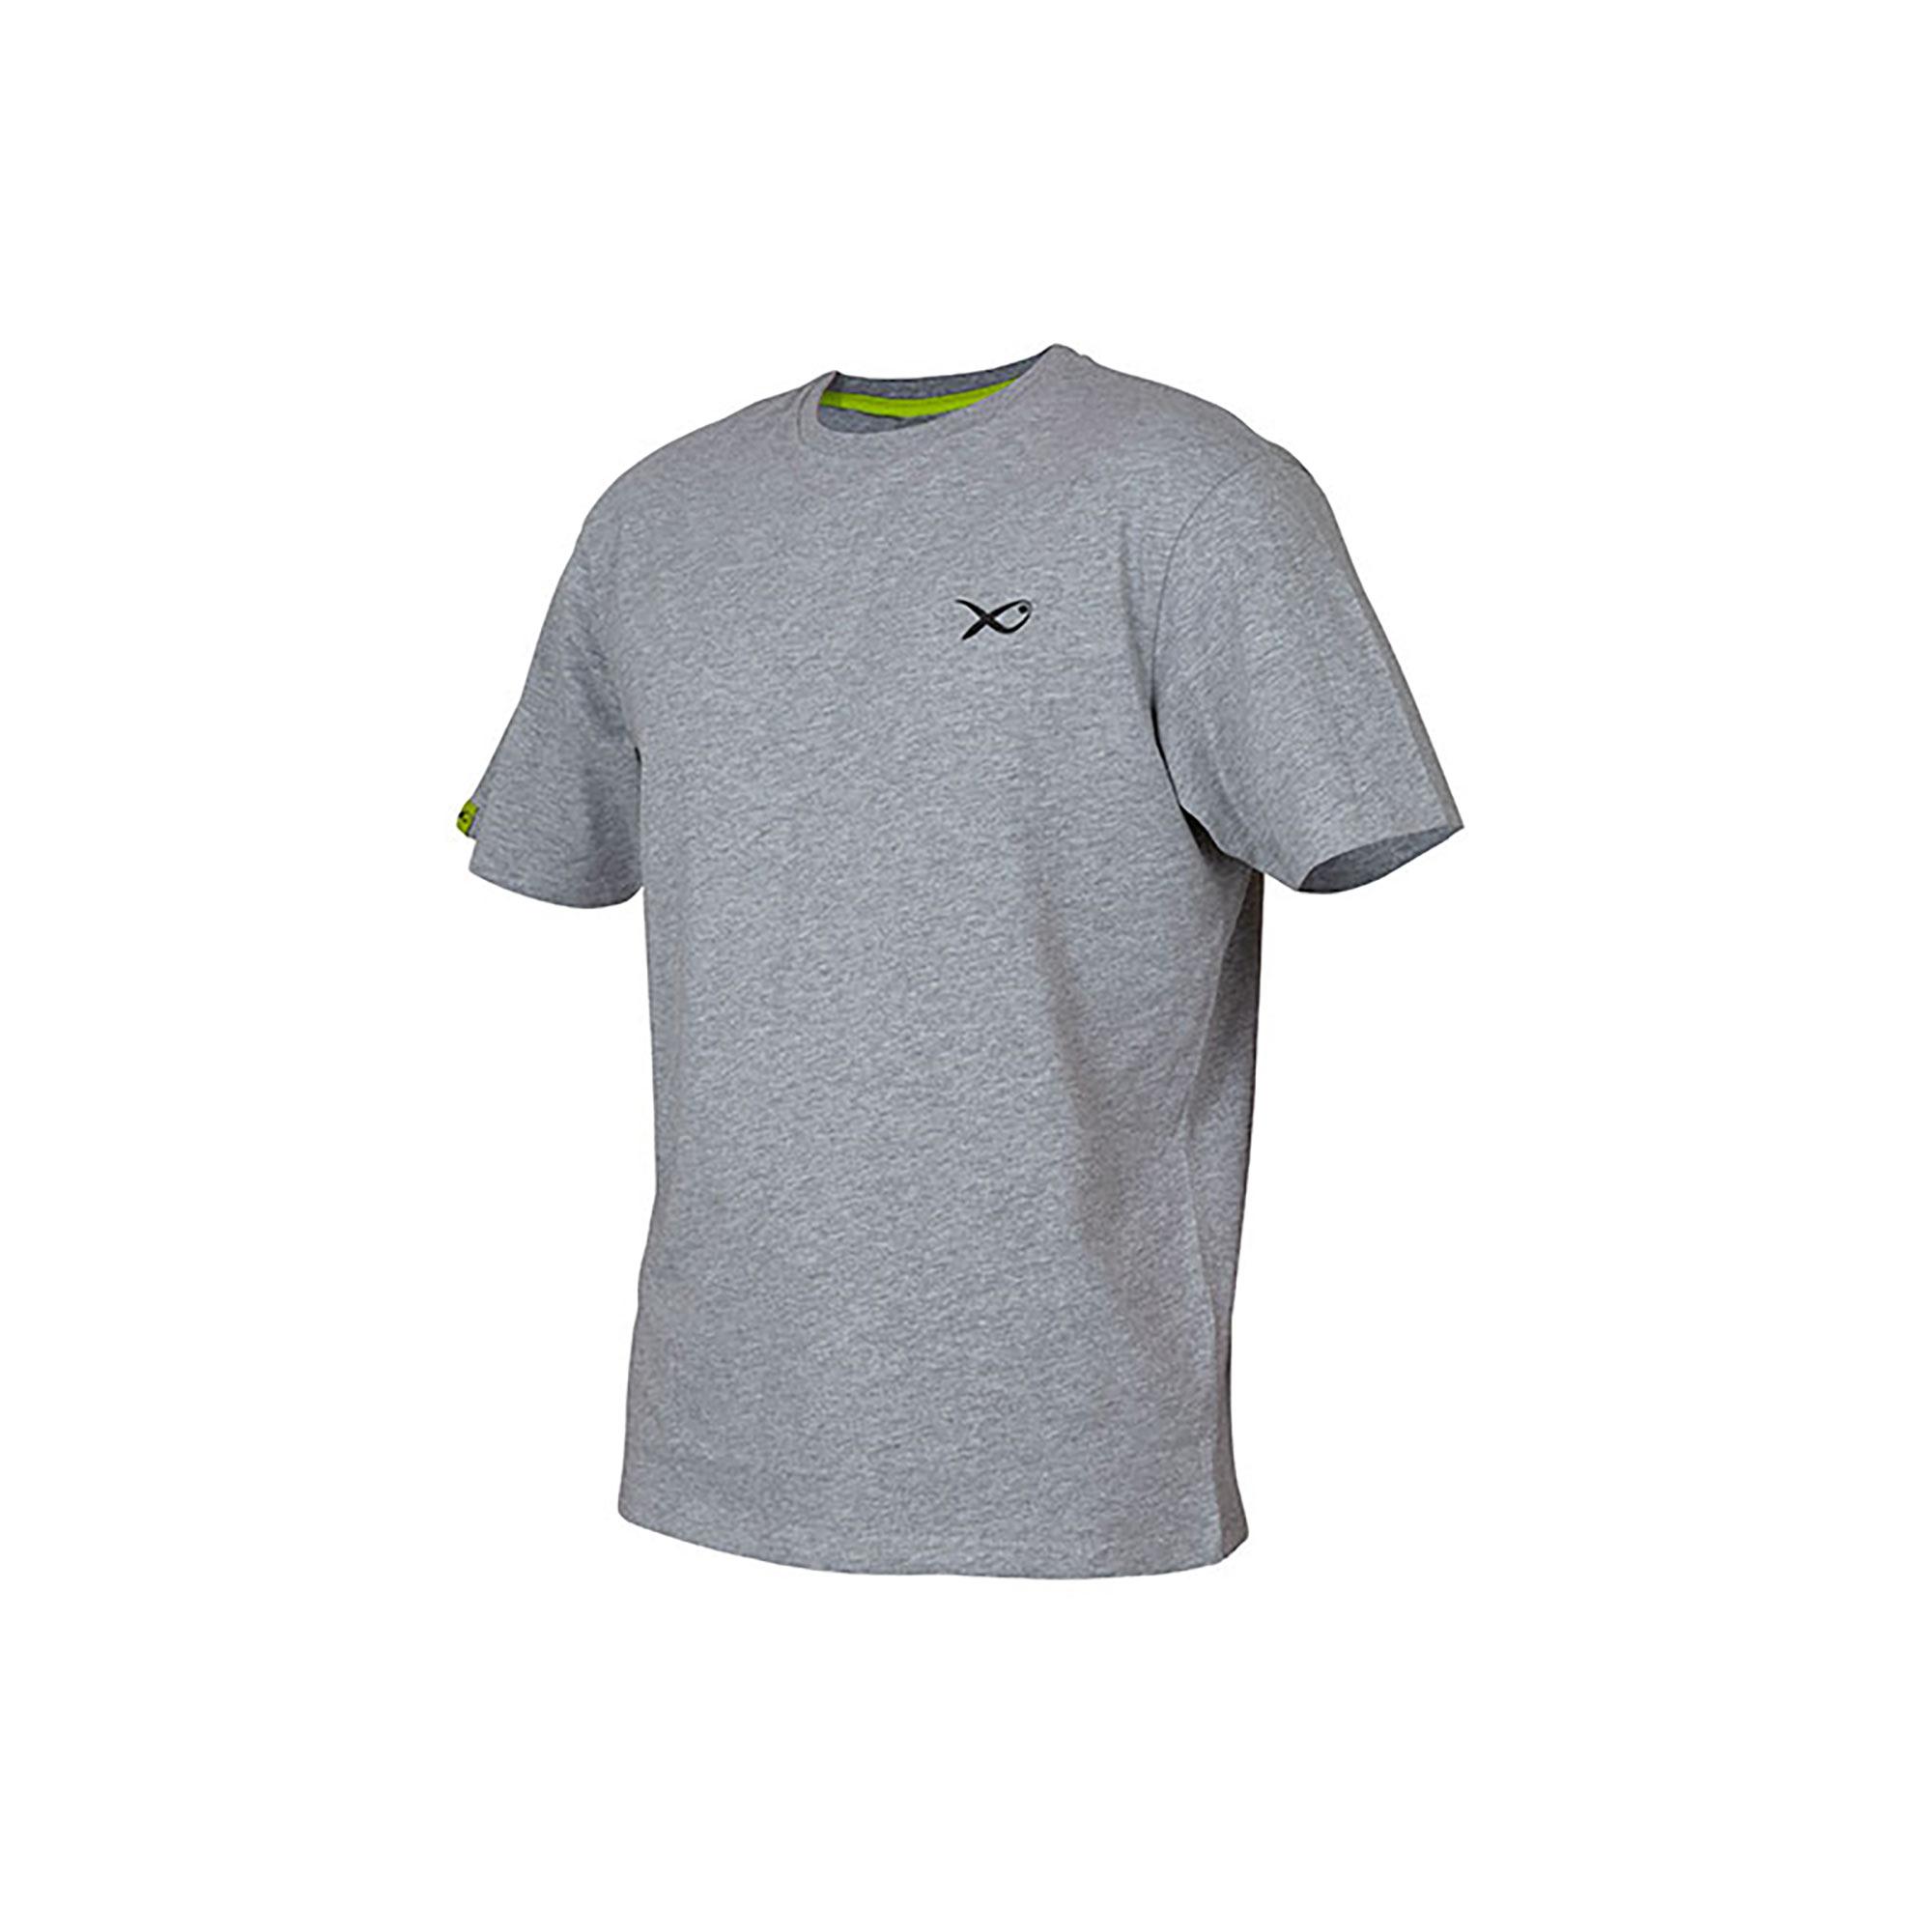 T-shirt Grey MATRIX